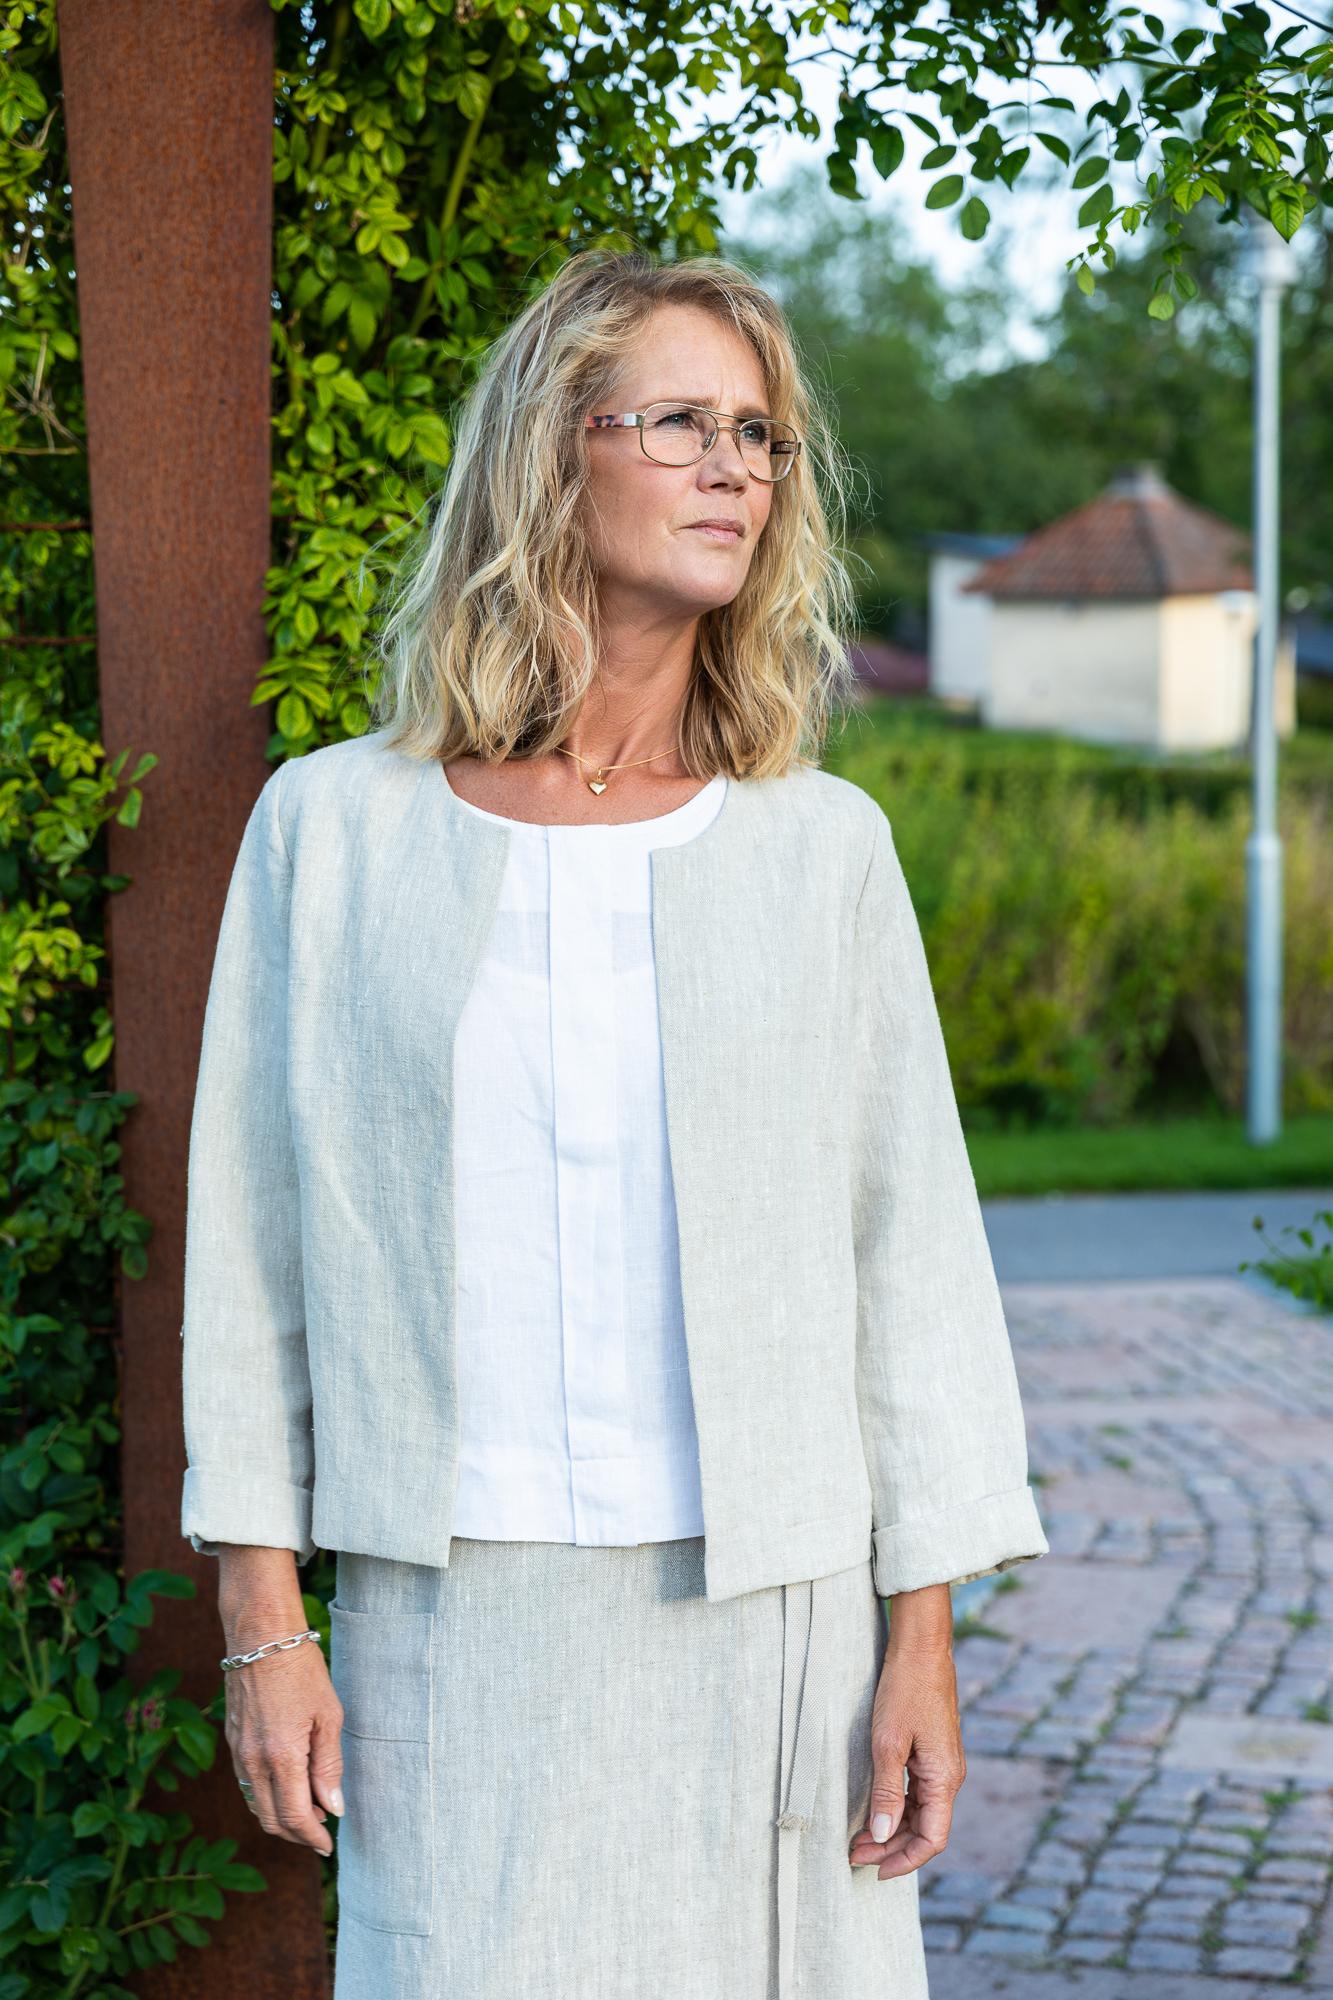 Jacka Rakel i cert linne. Sys i Sverige.